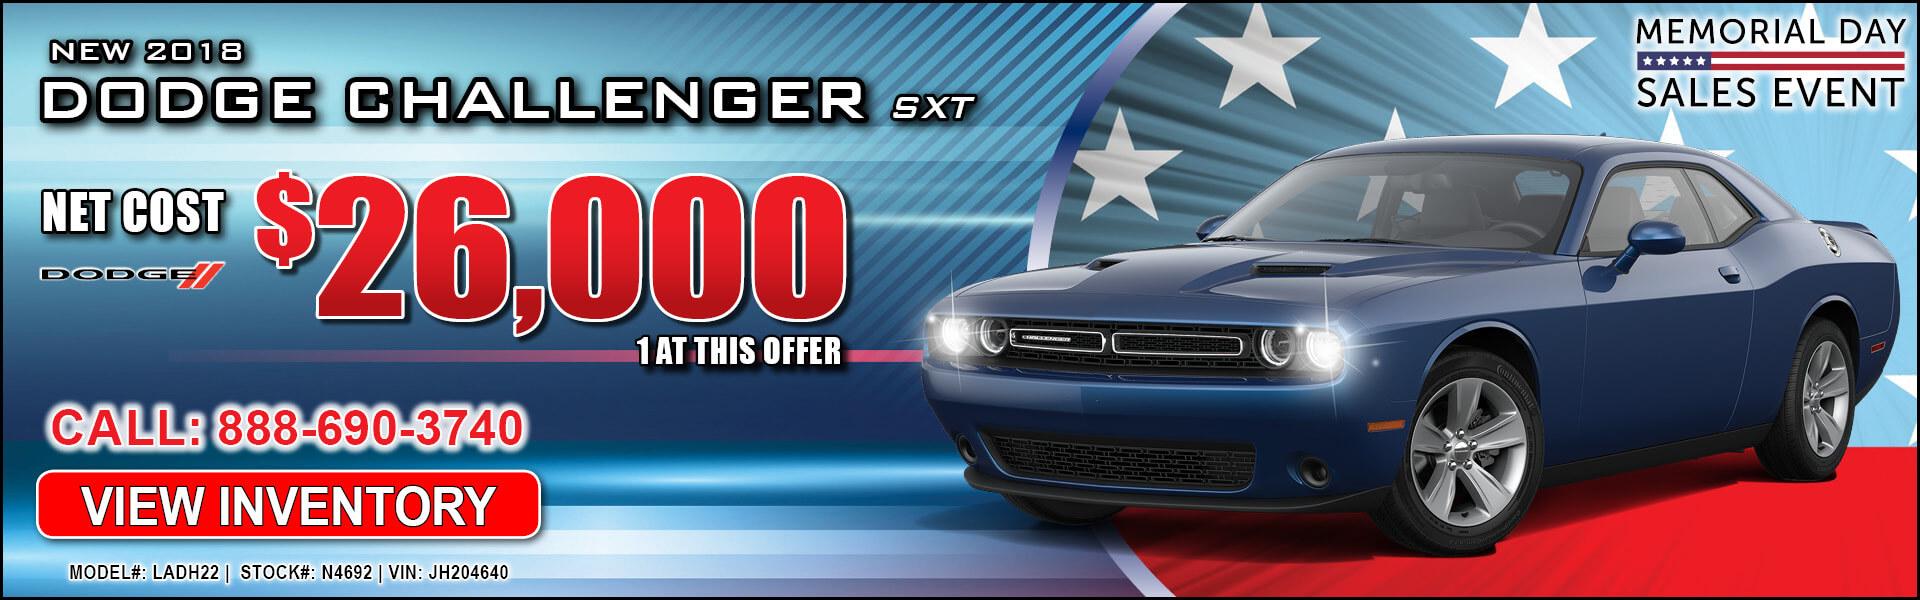 Dodge Challenger $26,000